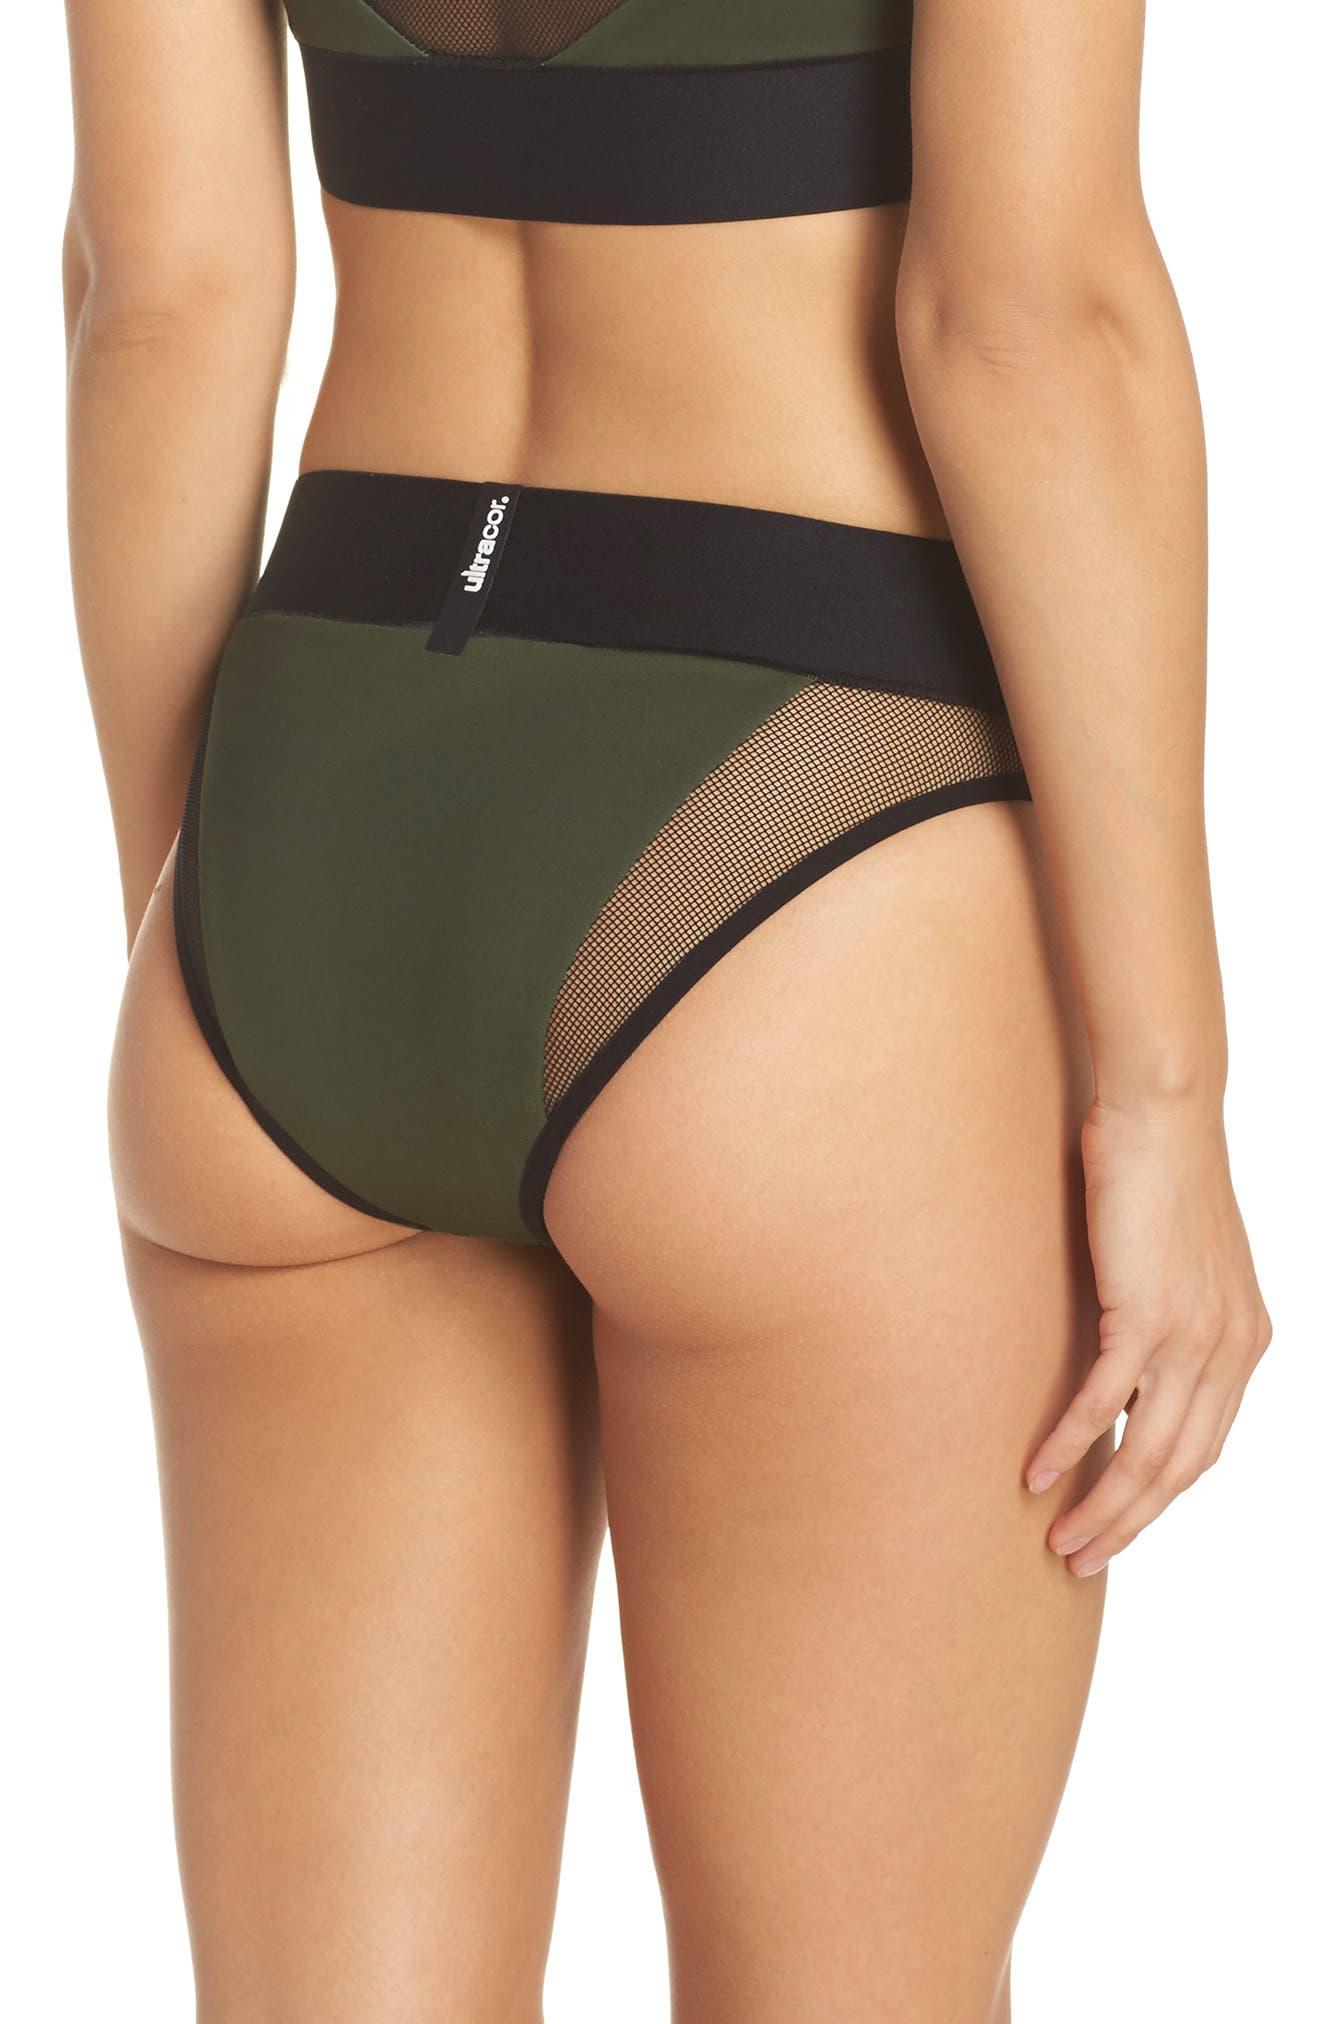 Reef Sport Mesh High-Waist Bikini Bottoms,                             Alternate thumbnail 2, color,                             302